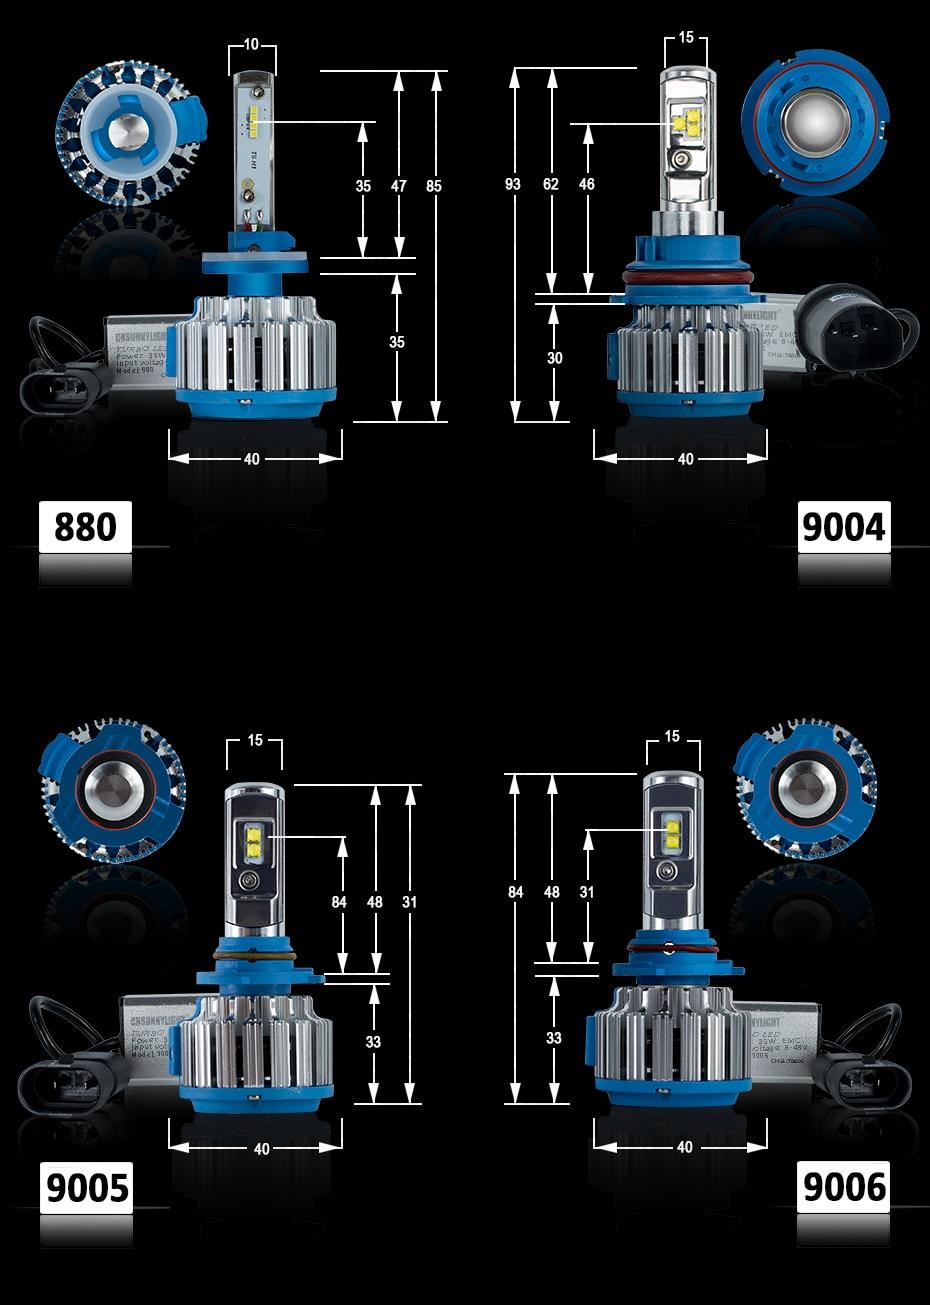 HTB19zGAbgmTBuNjy1Xbq6yMrVXav CNSUNNYLIGHT Car Headlight H7 H4 LED H8/H11 HB3/9005 HB4/9006 H1 H3 9012 H13 9004 9007 70W 7000lm Auto Bulb Headlamp 6000K Light